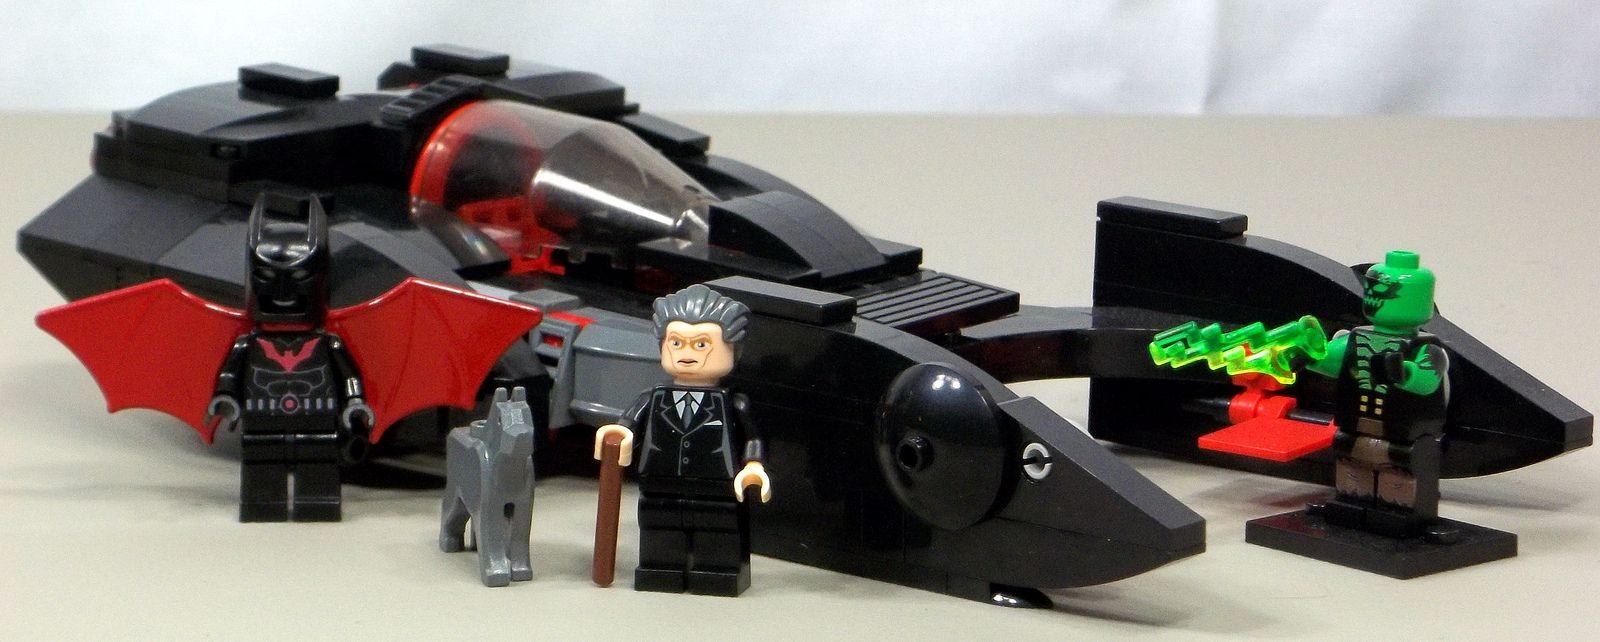 custom lego batman beyond batmobile custom lego lego batman and batmobile. Black Bedroom Furniture Sets. Home Design Ideas